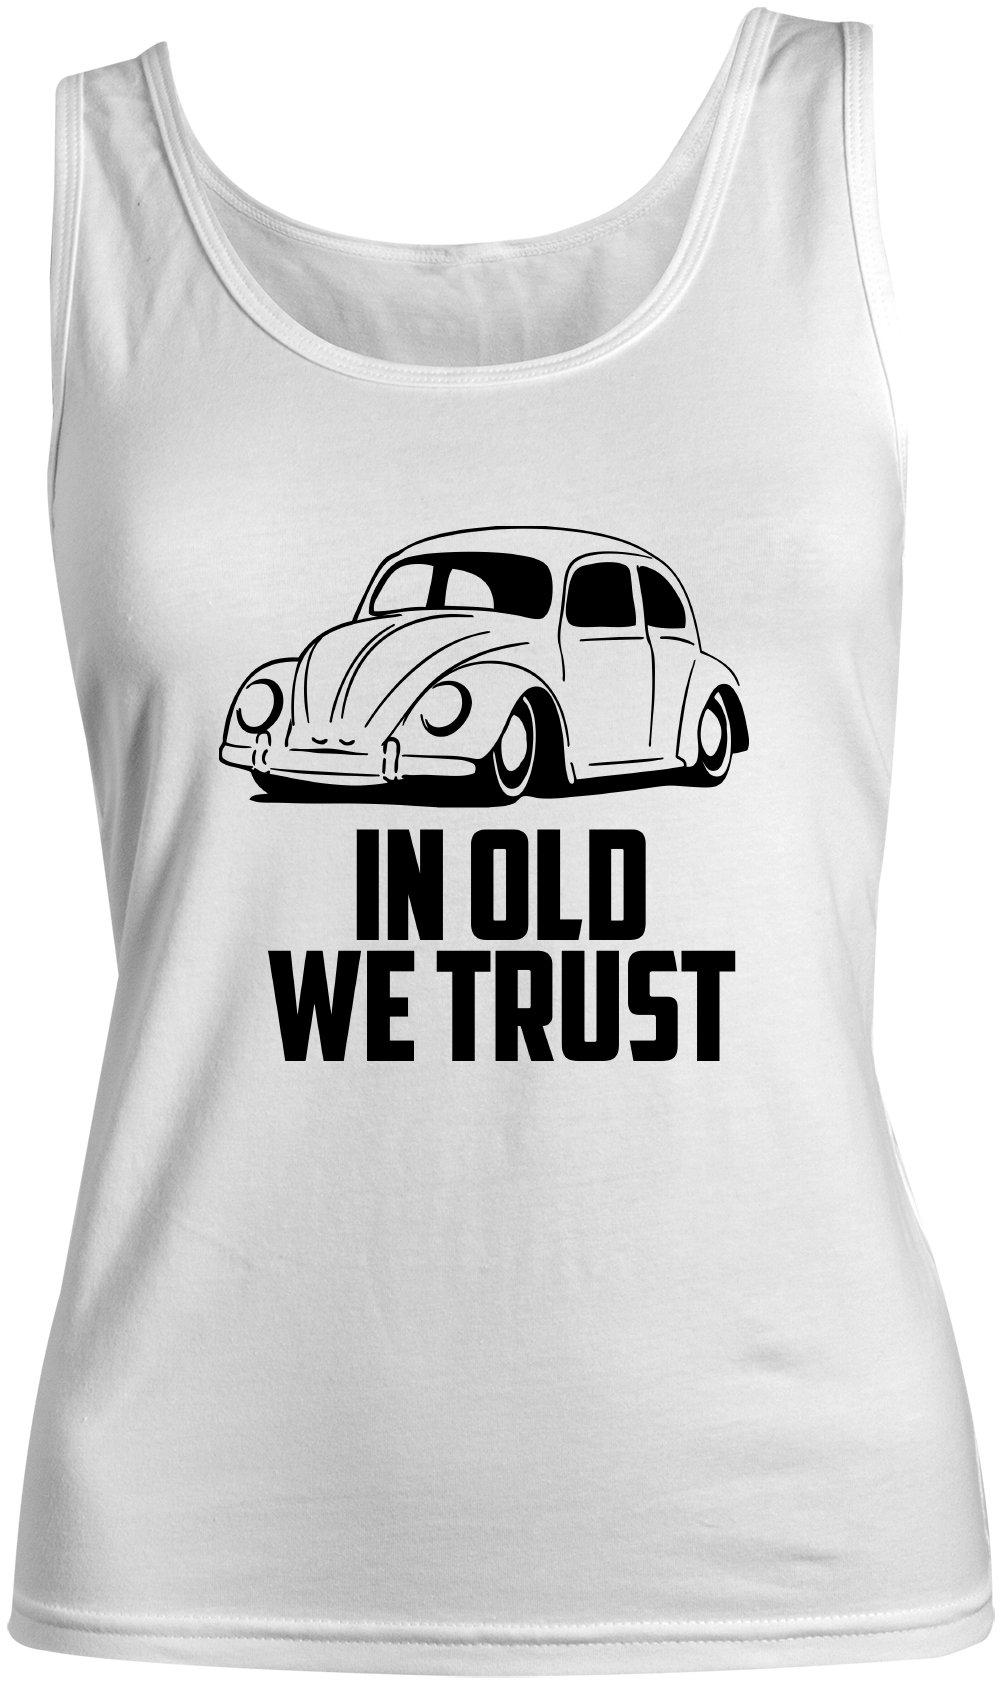 In Old We Trust Tank Top Sleeveless Shirt X 1800